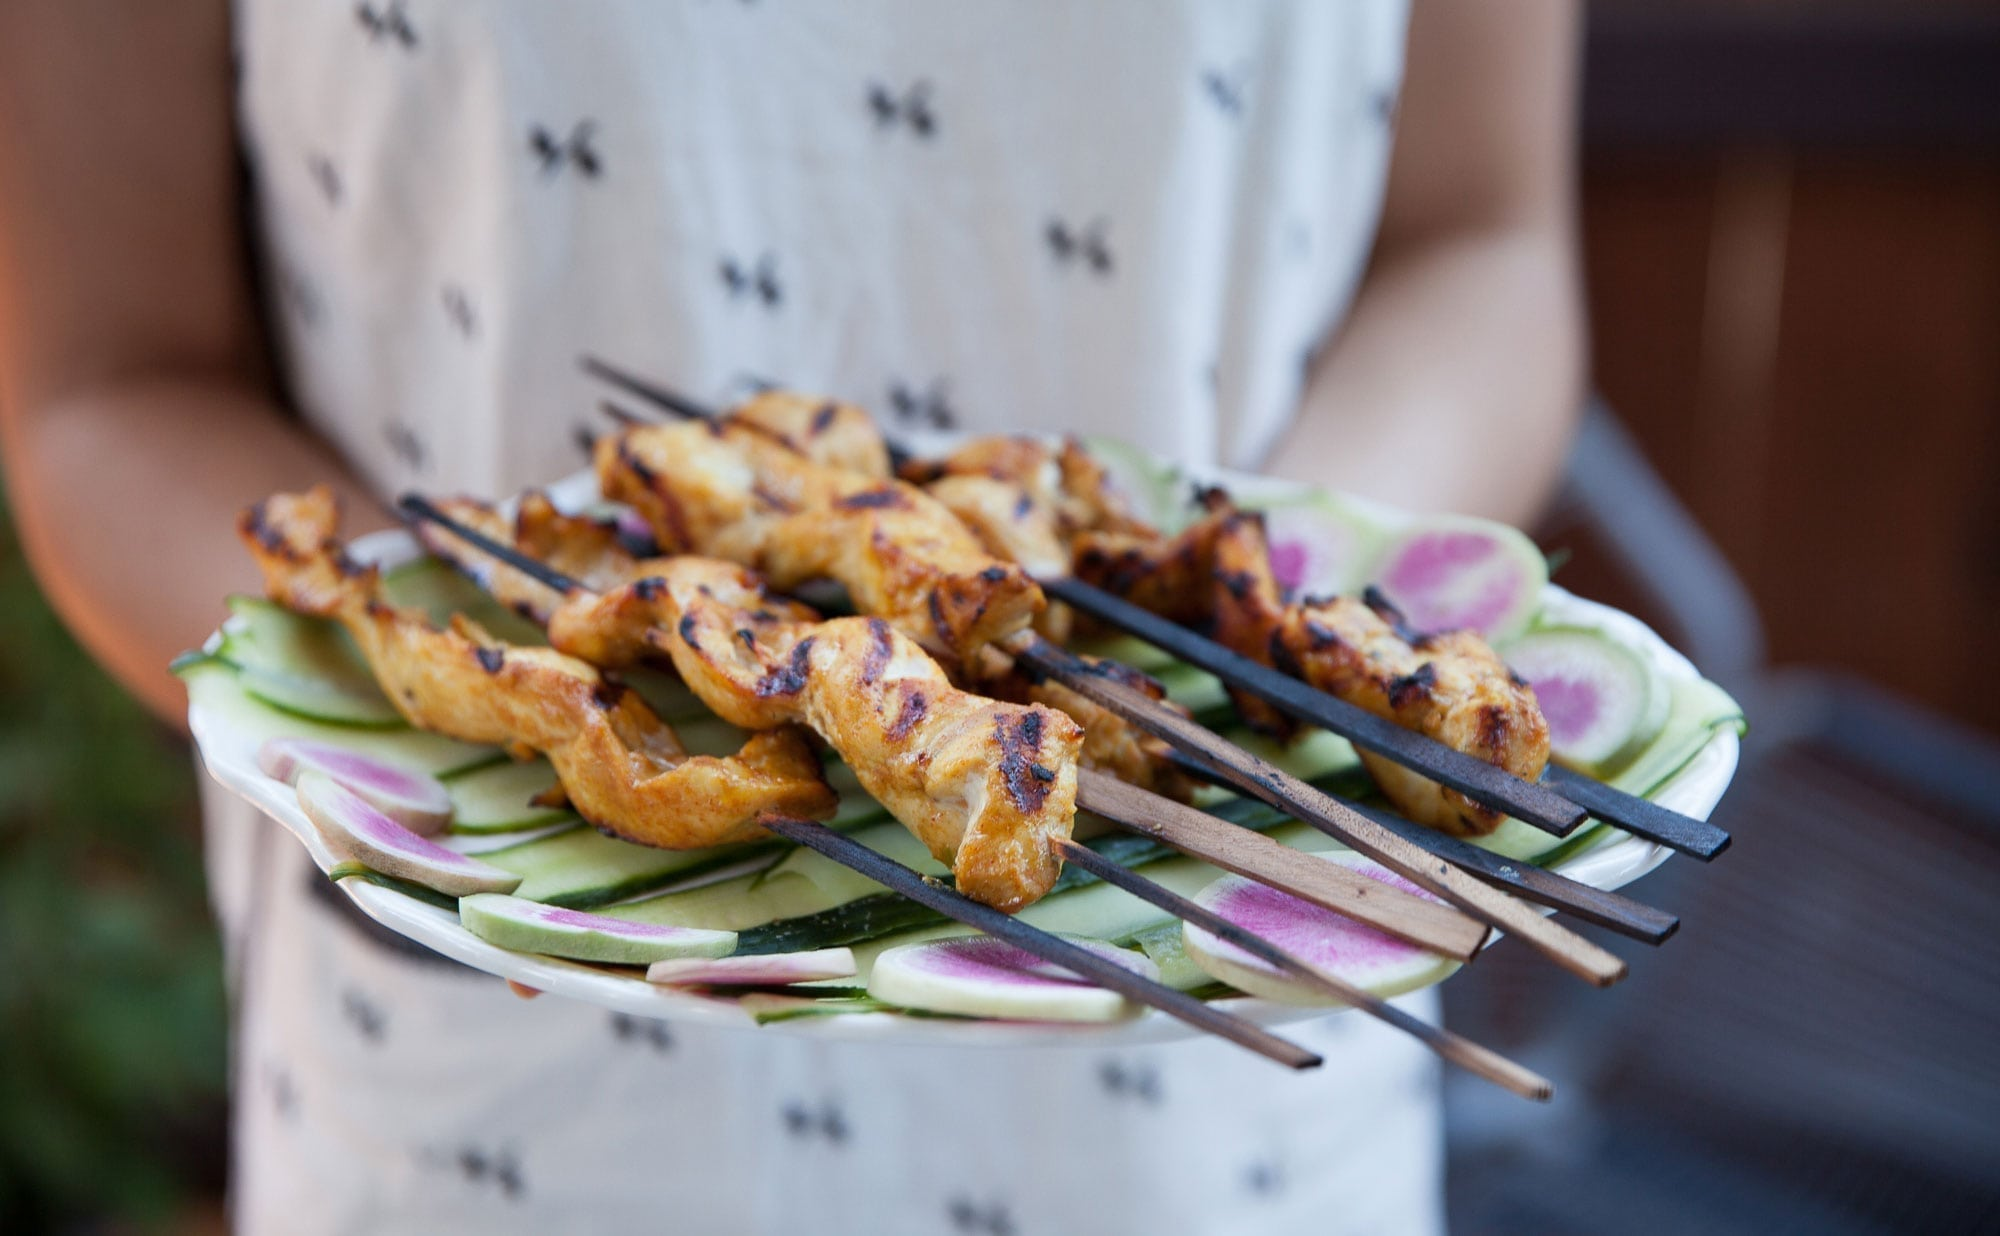 Thai Chicken Skewers with Peanut Sauce